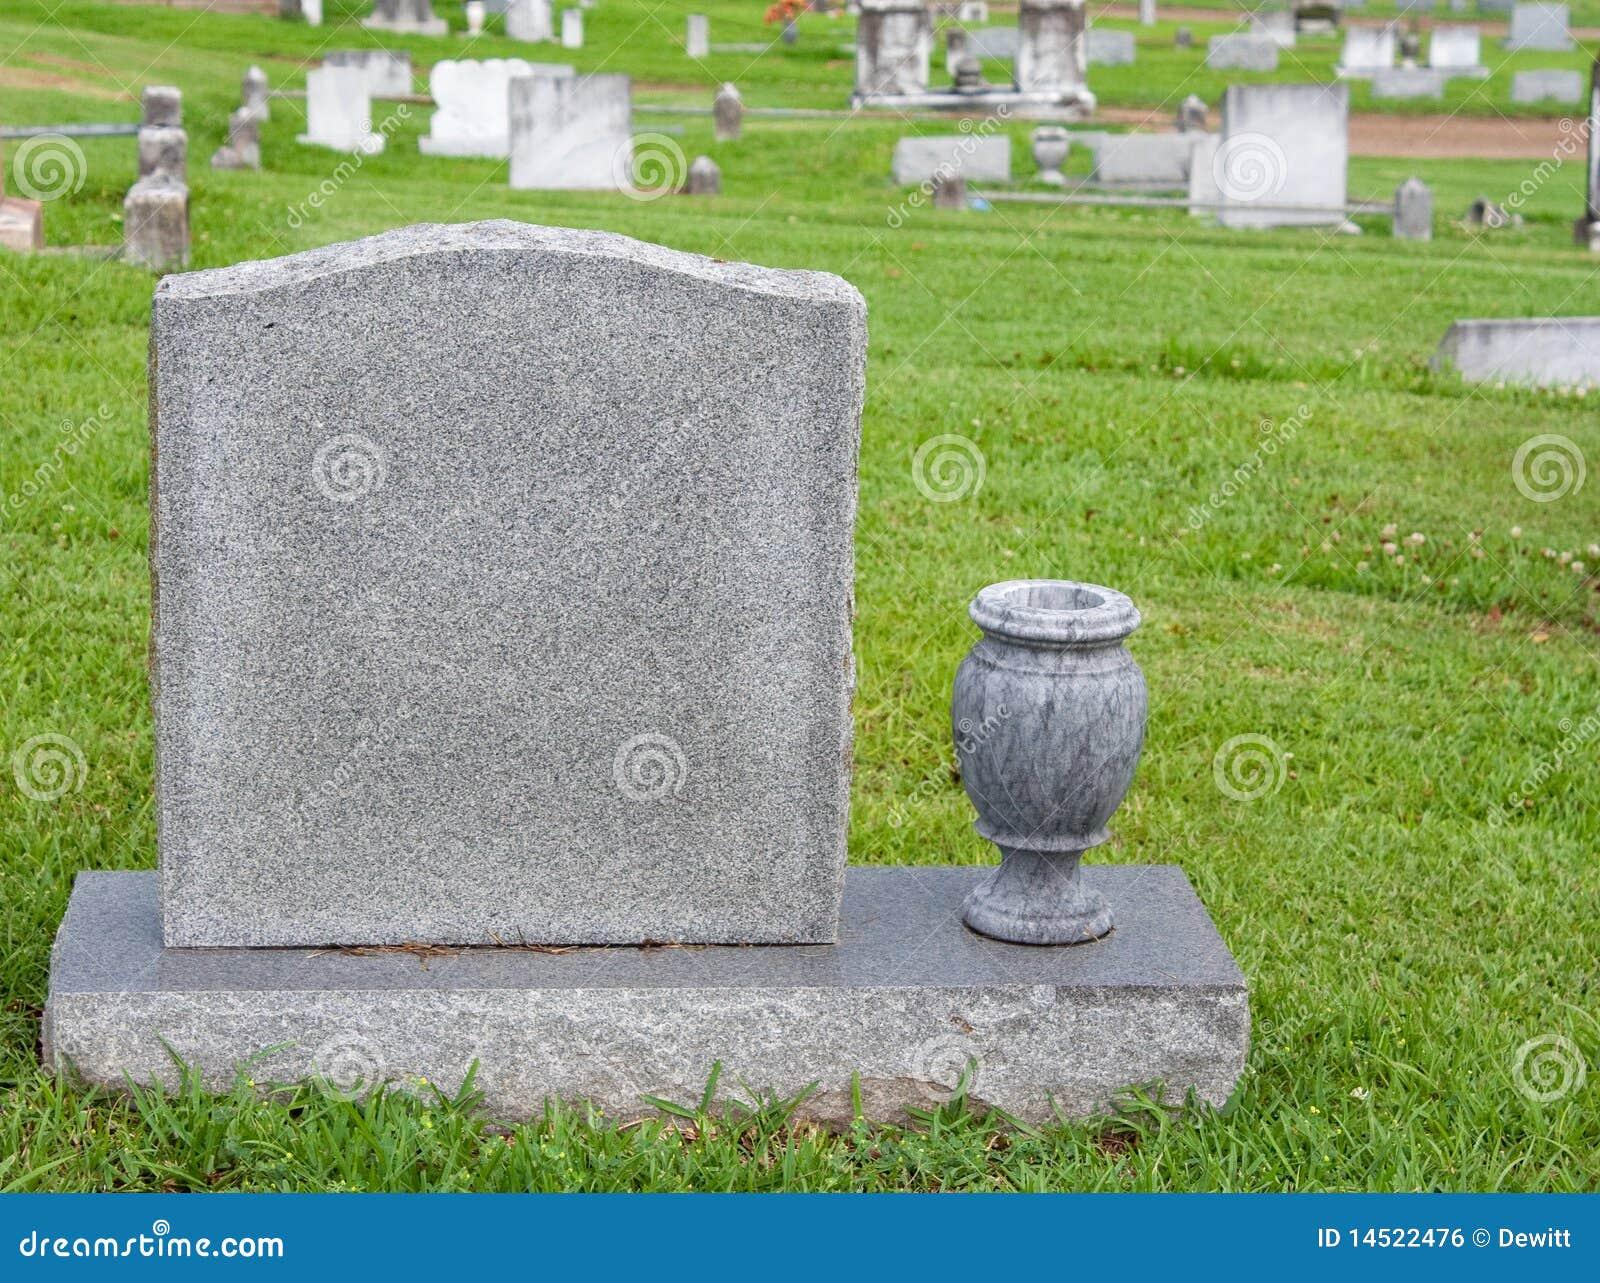 Headstone And Vase Royalty Free Stock Image Image 14522476